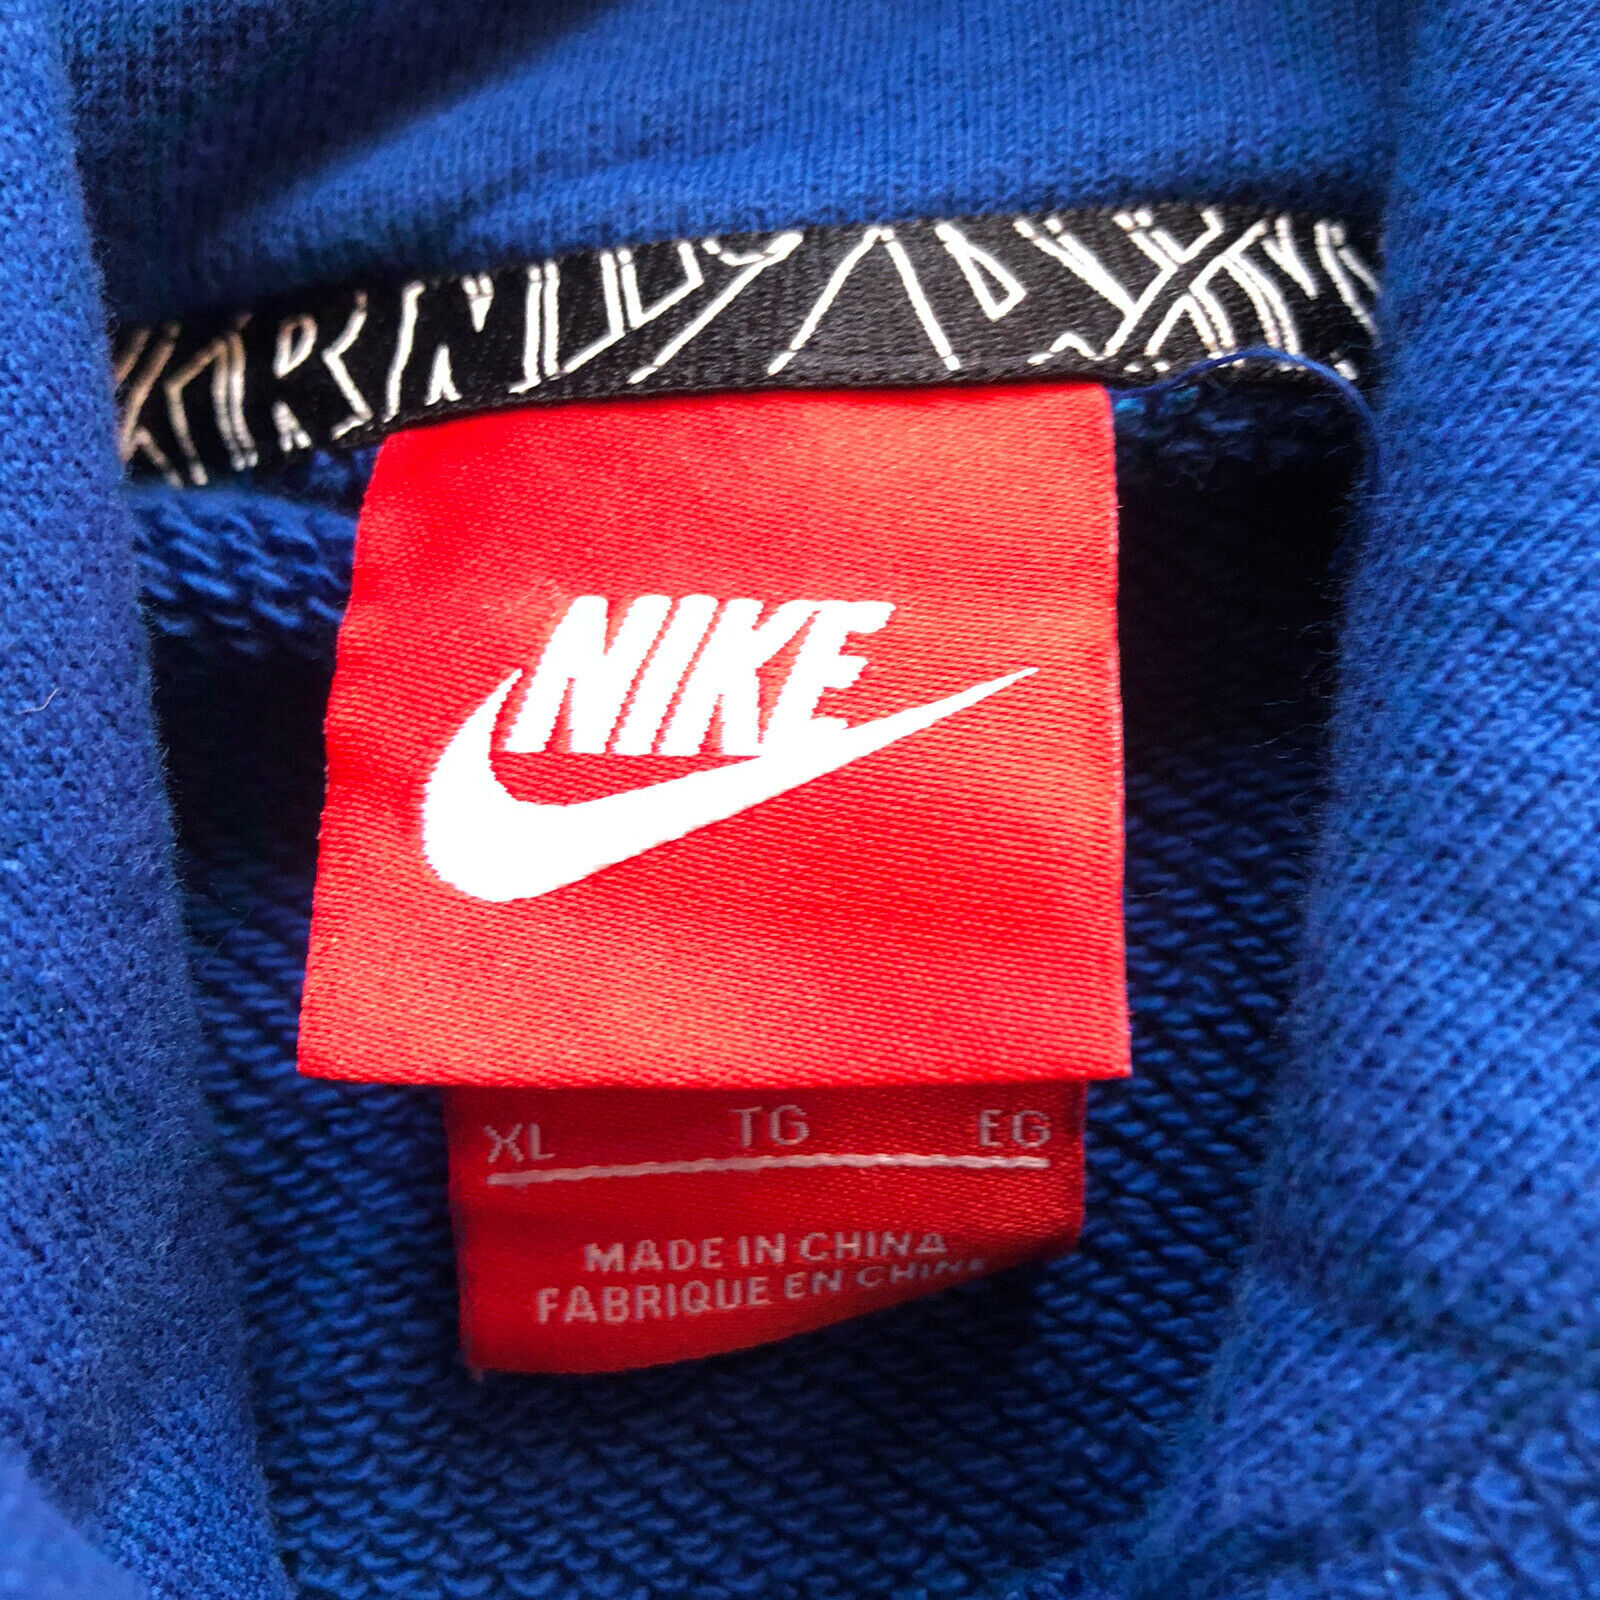 Vintage 1990s Nike Air Jordan Basketball Tee Shir… - image 5